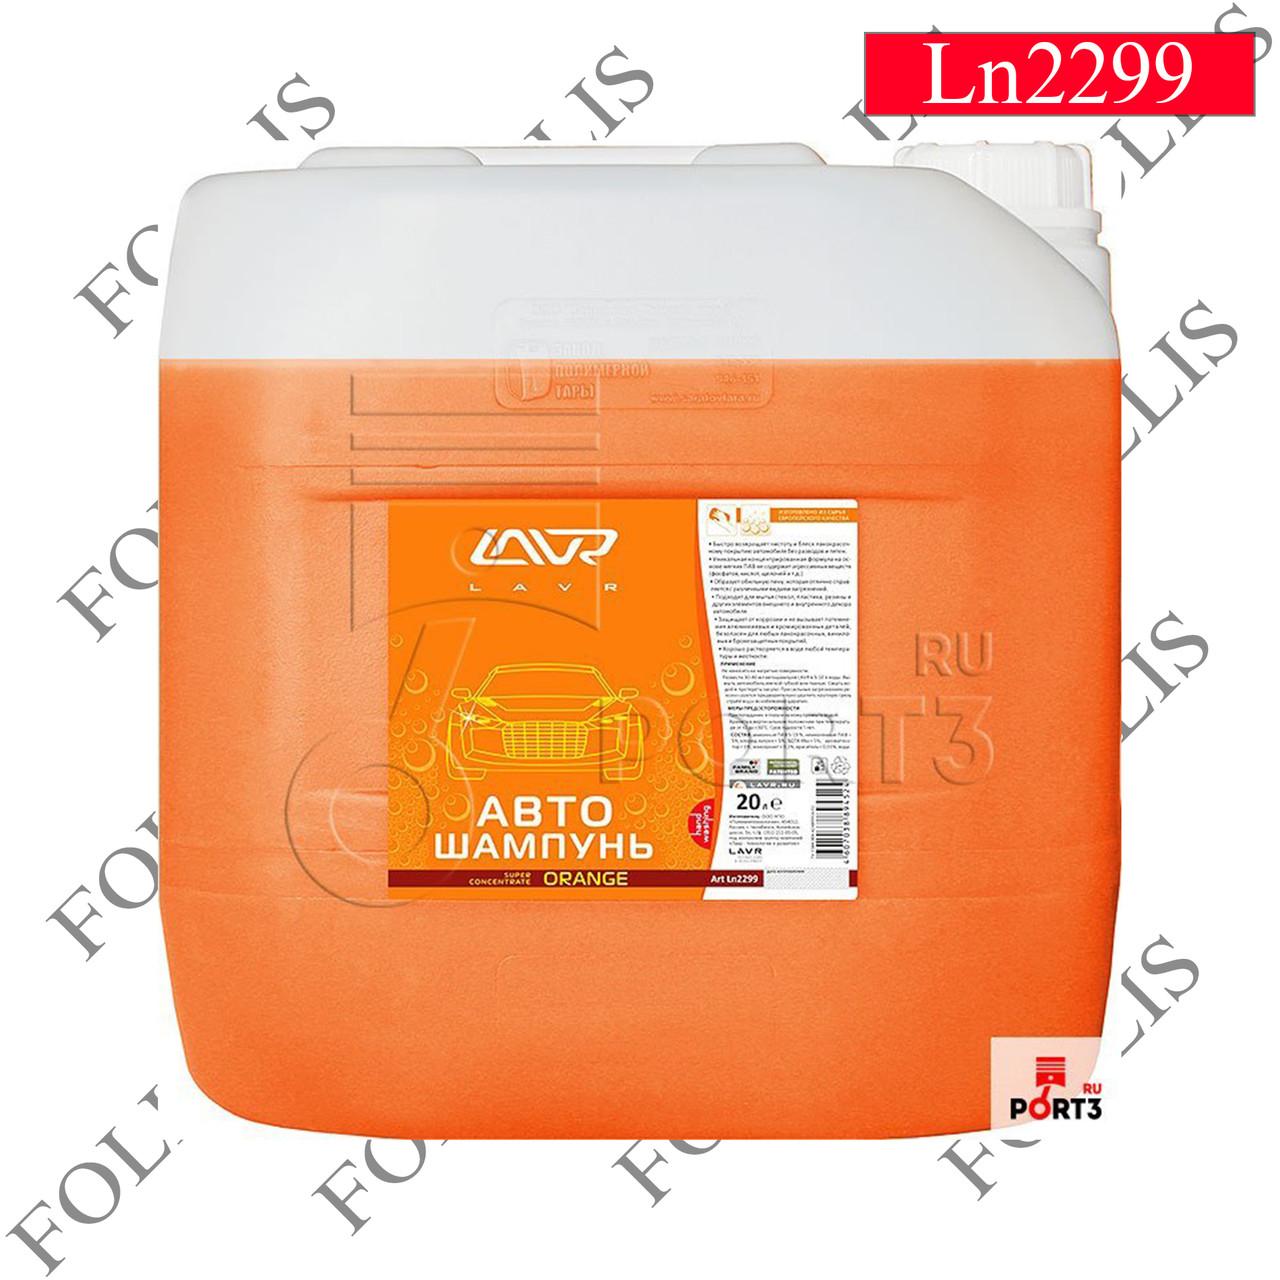 Автошампунь-суперконцентрат Orange 1:120 - 1:320 LAVR Auto Shampoo Super Concentrate, 20л